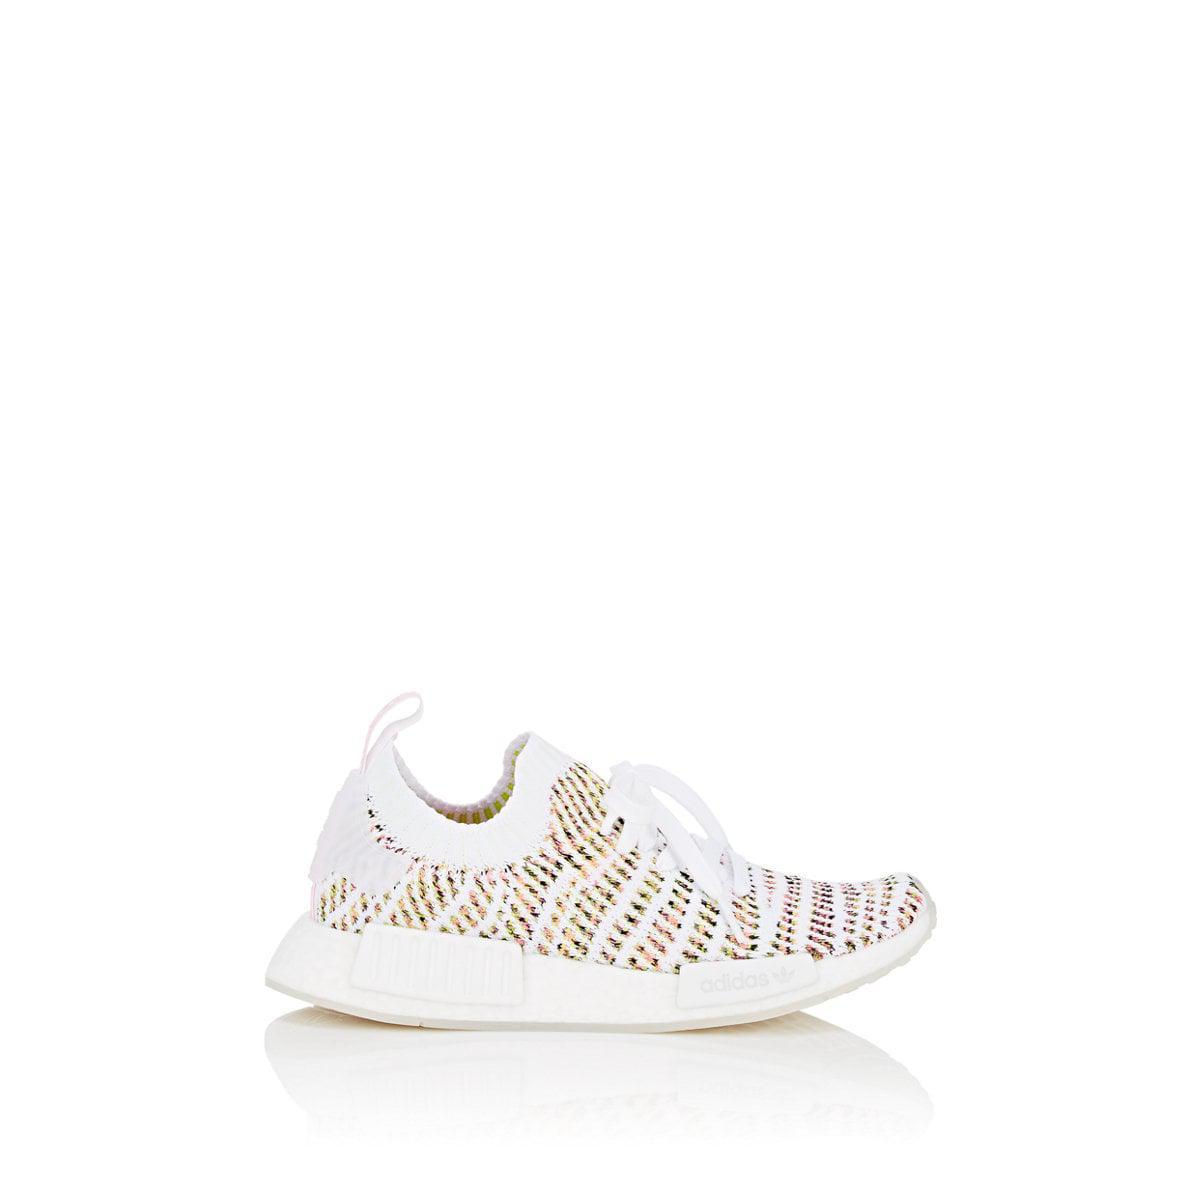 buy online 50867 dc972 adidas. Women s White Nmd R1 Stlt Primeknit Sneakers ...